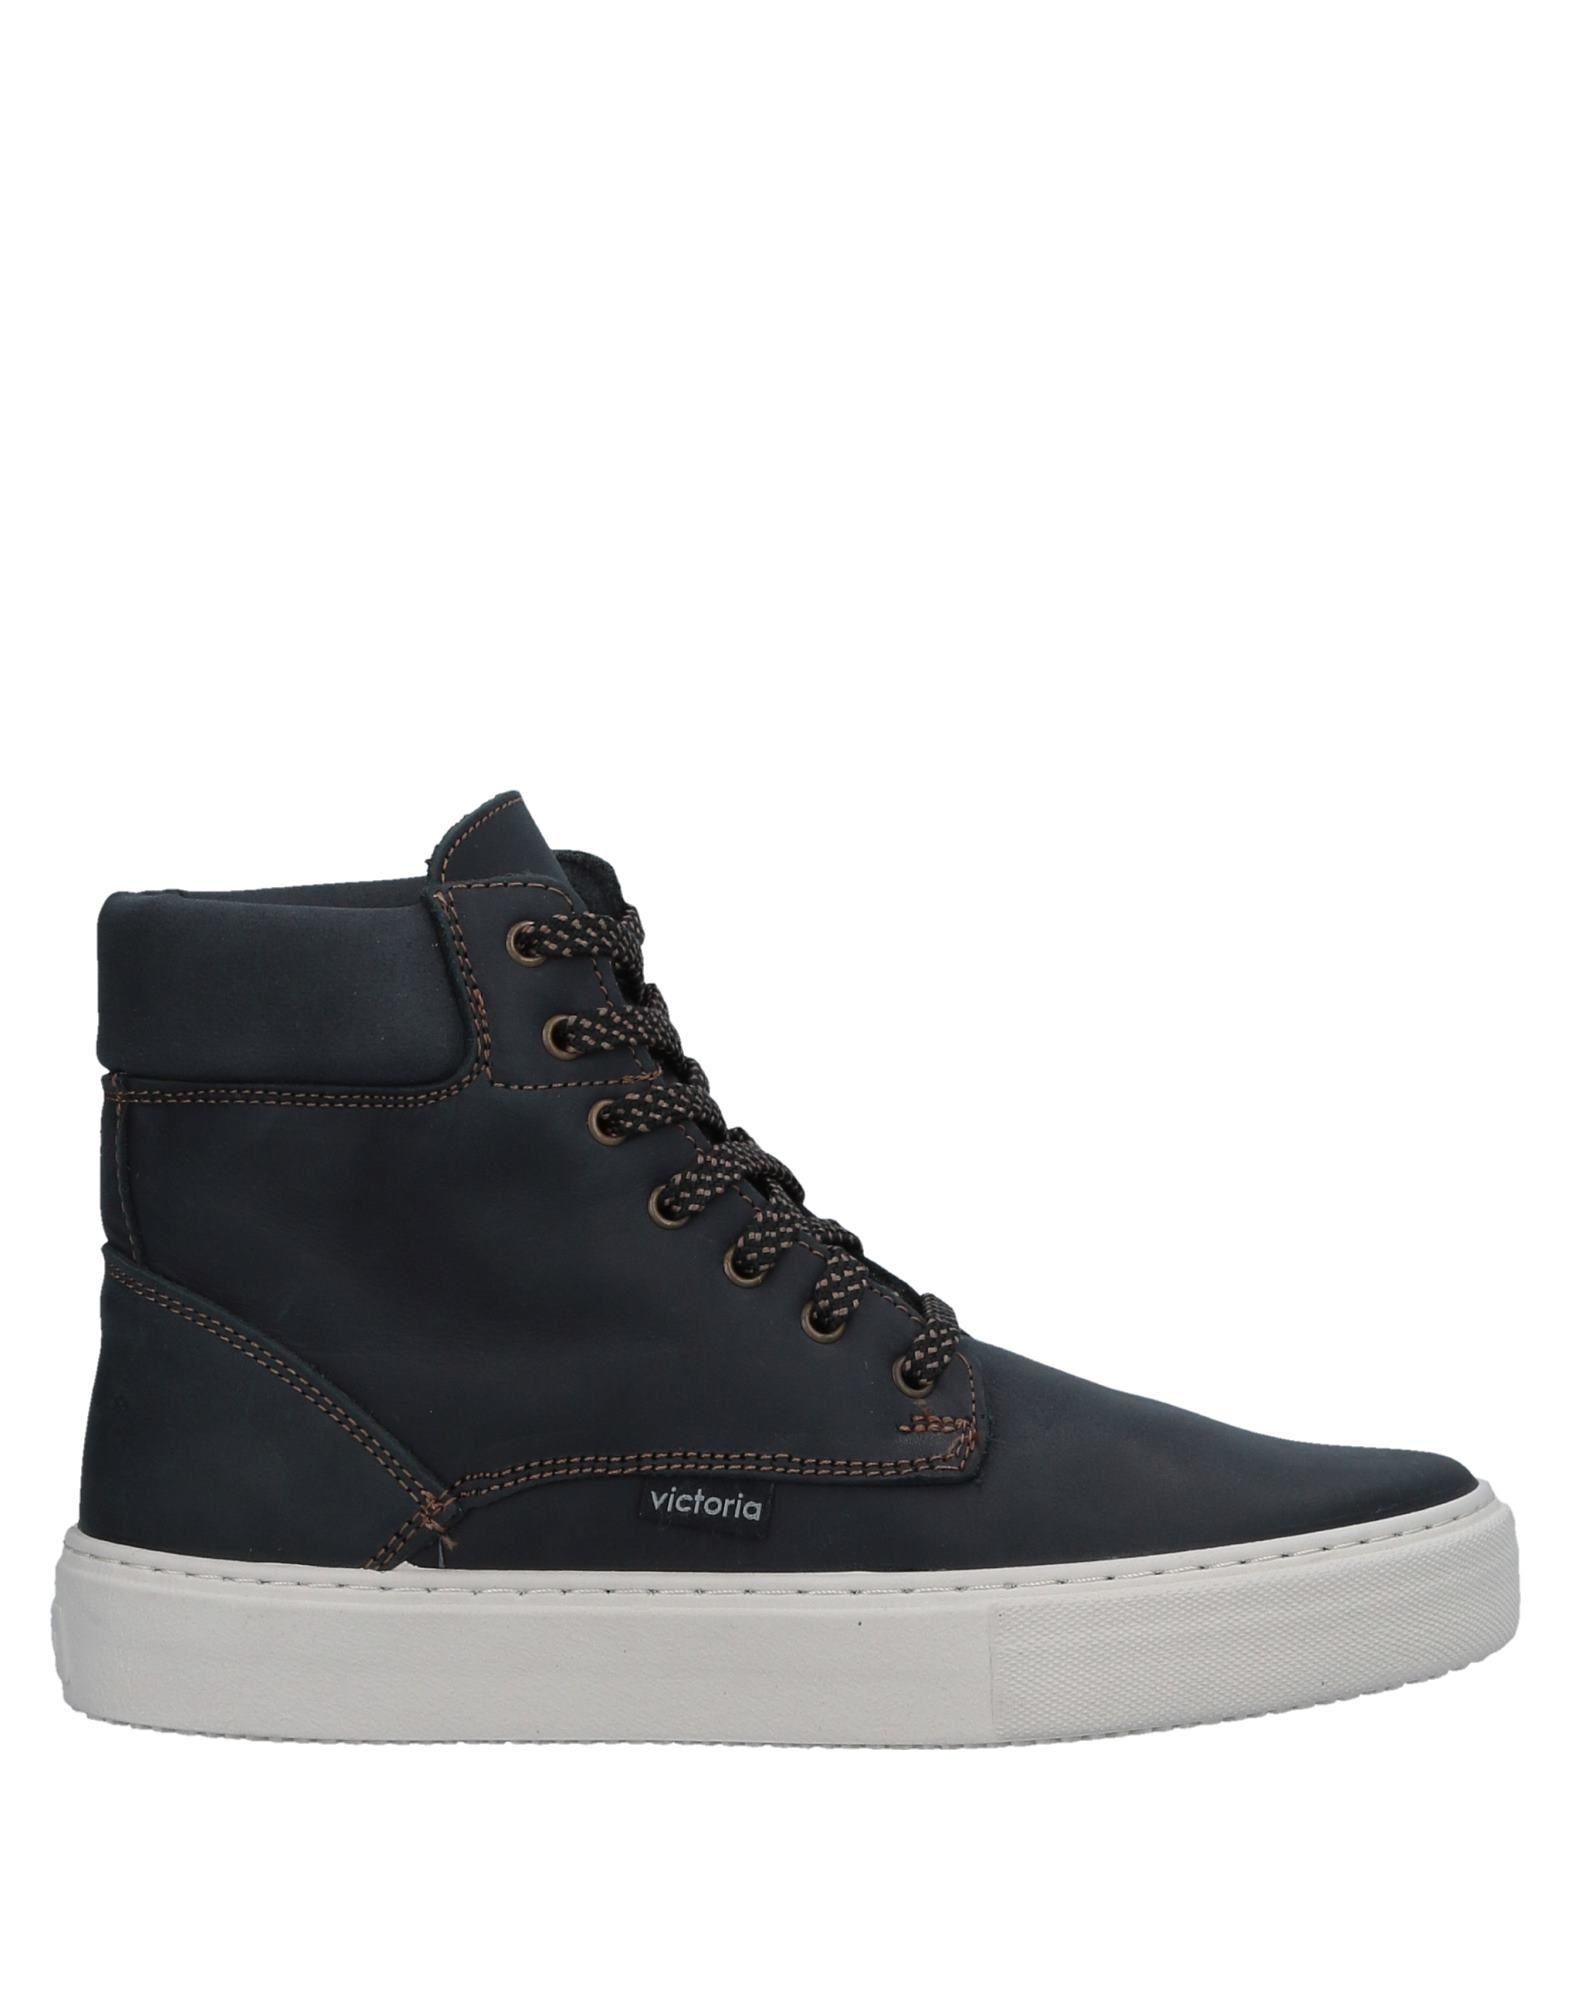 Victoria Sneakers Damen  11527941NV Gute Qualität beliebte Schuhe